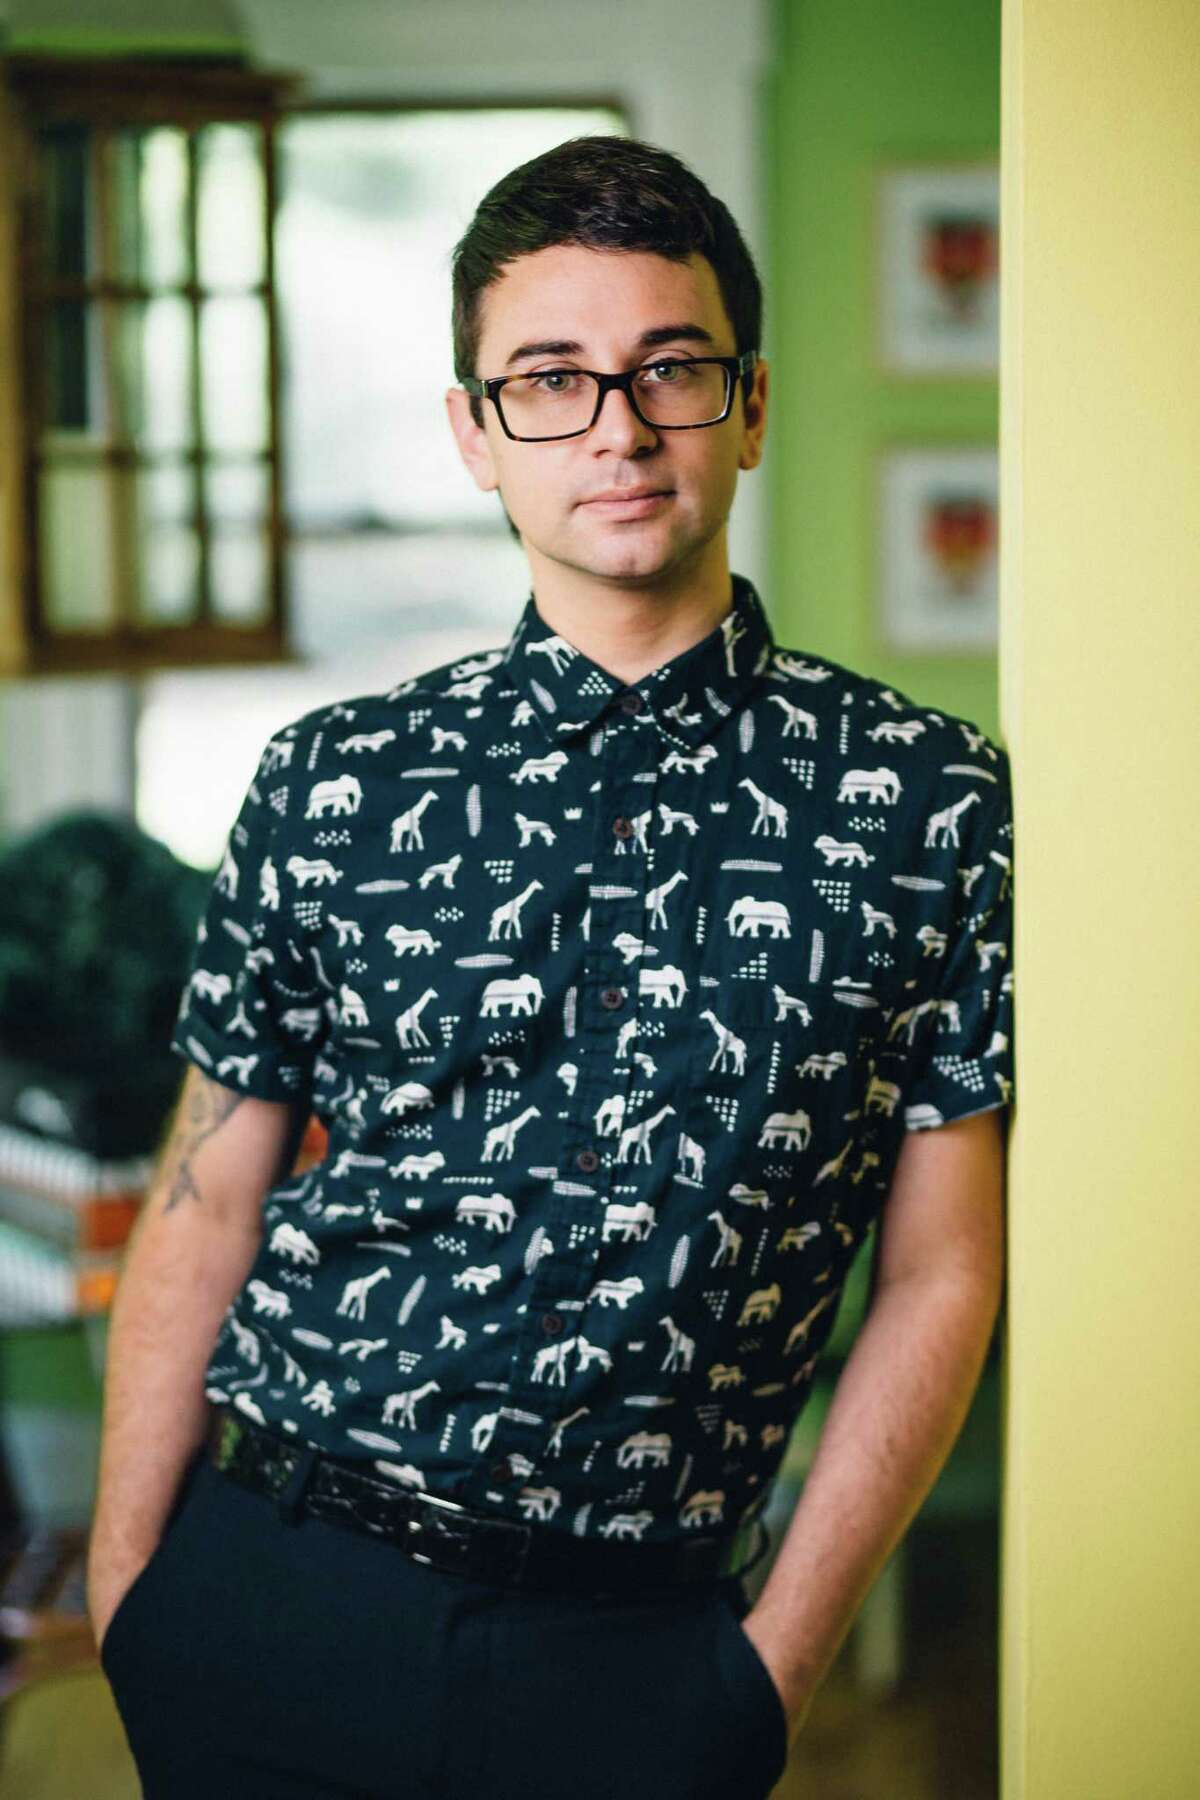 Fashion designer Christian Siriano inside of his Danbury home in 2016.